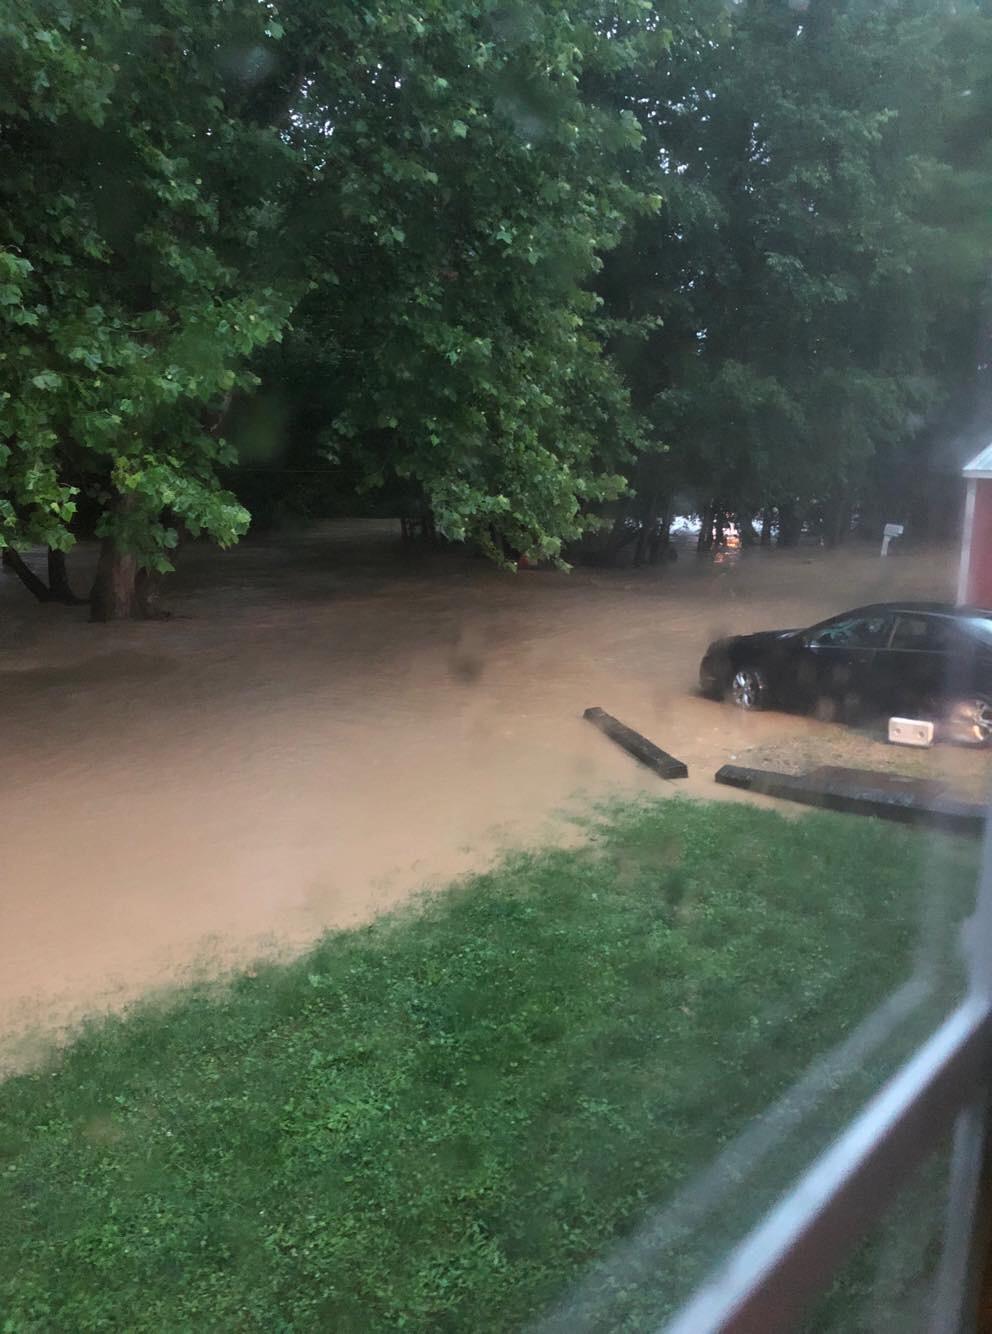 Flooding on Knockemstiff Rd - Scioto Post